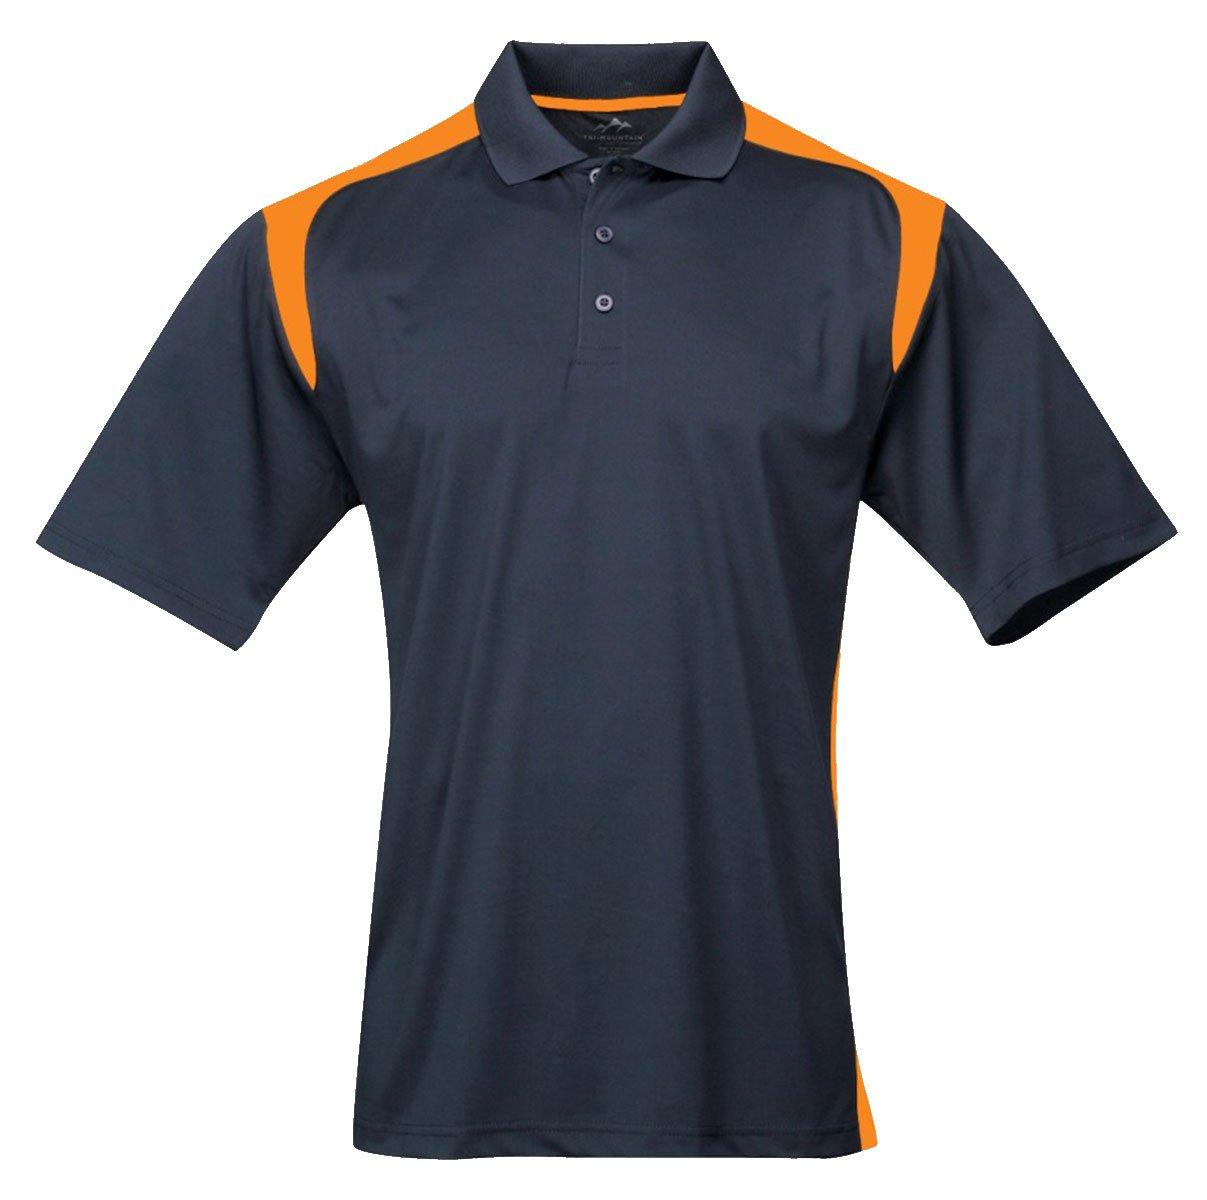 Tri-mountain Mens 100% Polyester UC Knit Polo Shirt. 145TM - NAVY / GOLD_XL